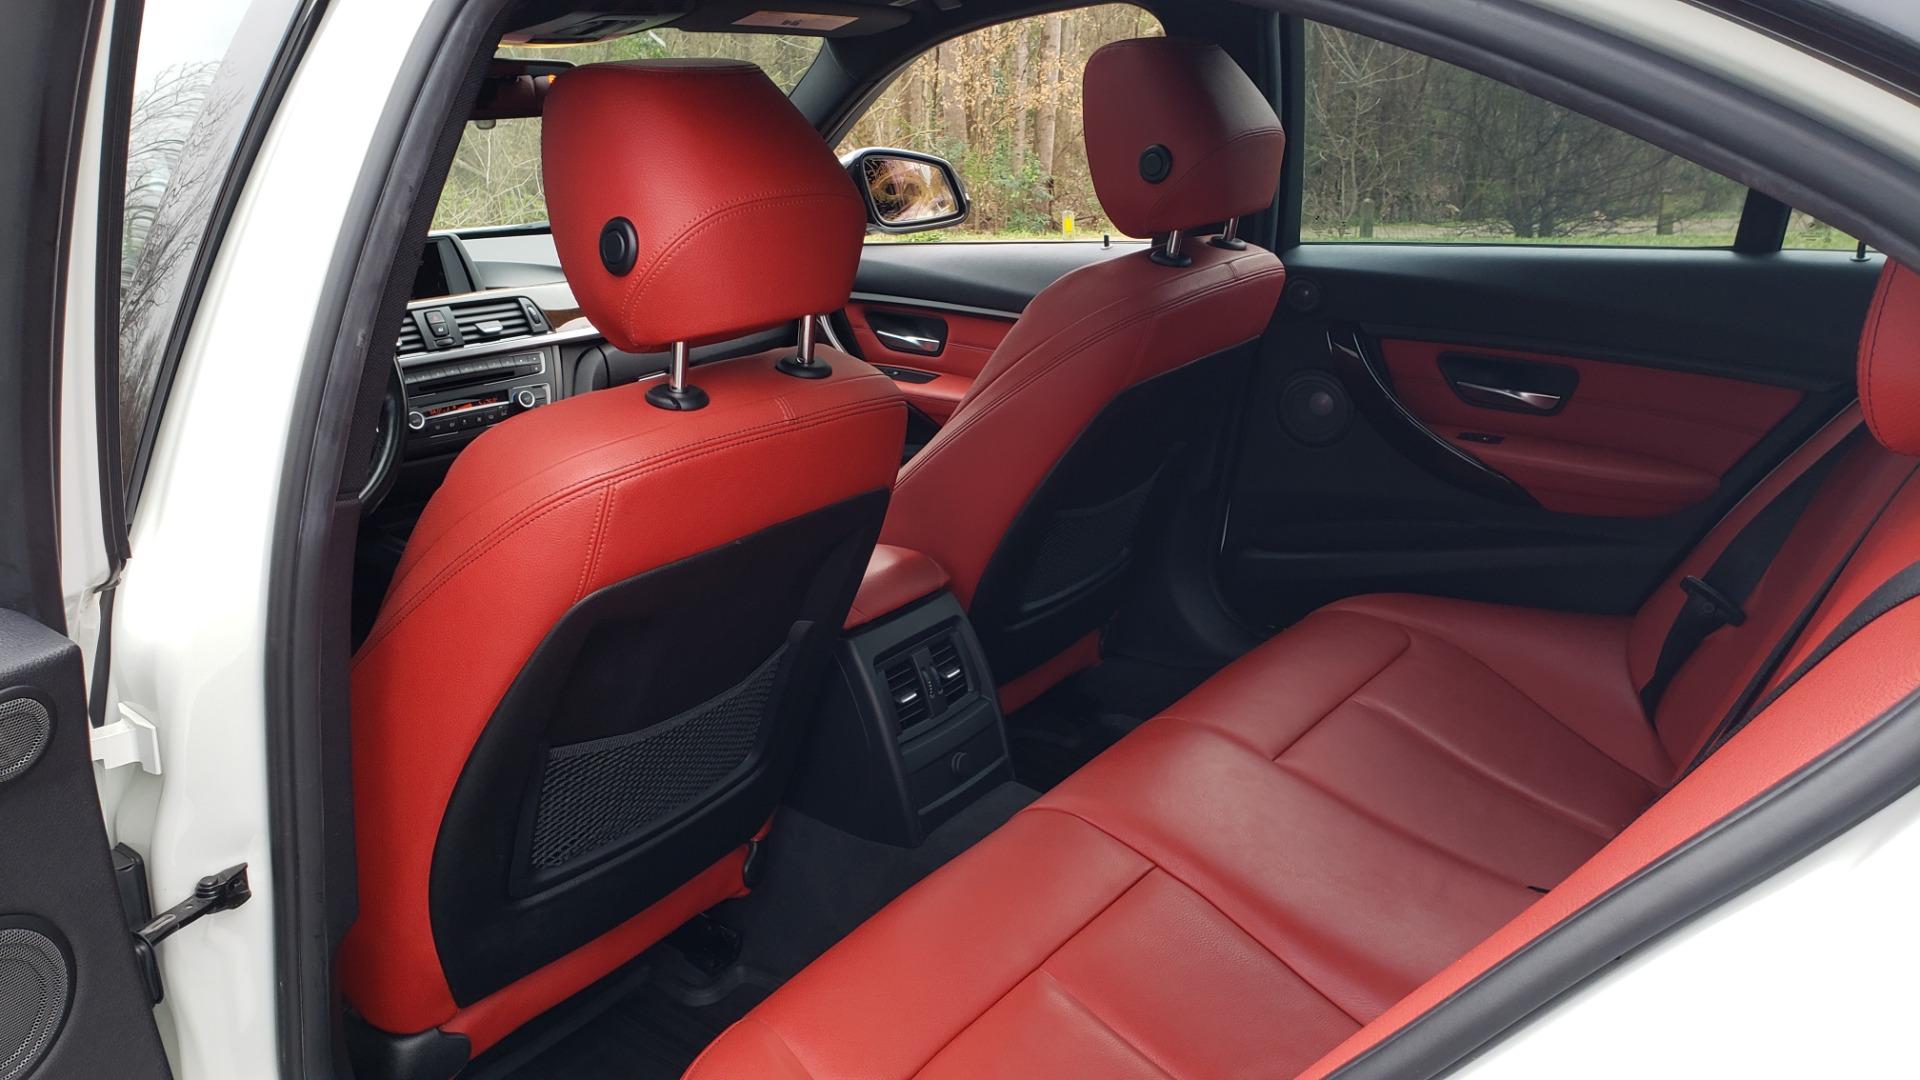 Used 2015 BMW 3 Series 335I M-SPORT / PREM PKG / HK SND / SUNROOF / REARVIEW for sale Sold at Formula Imports in Charlotte NC 28227 62